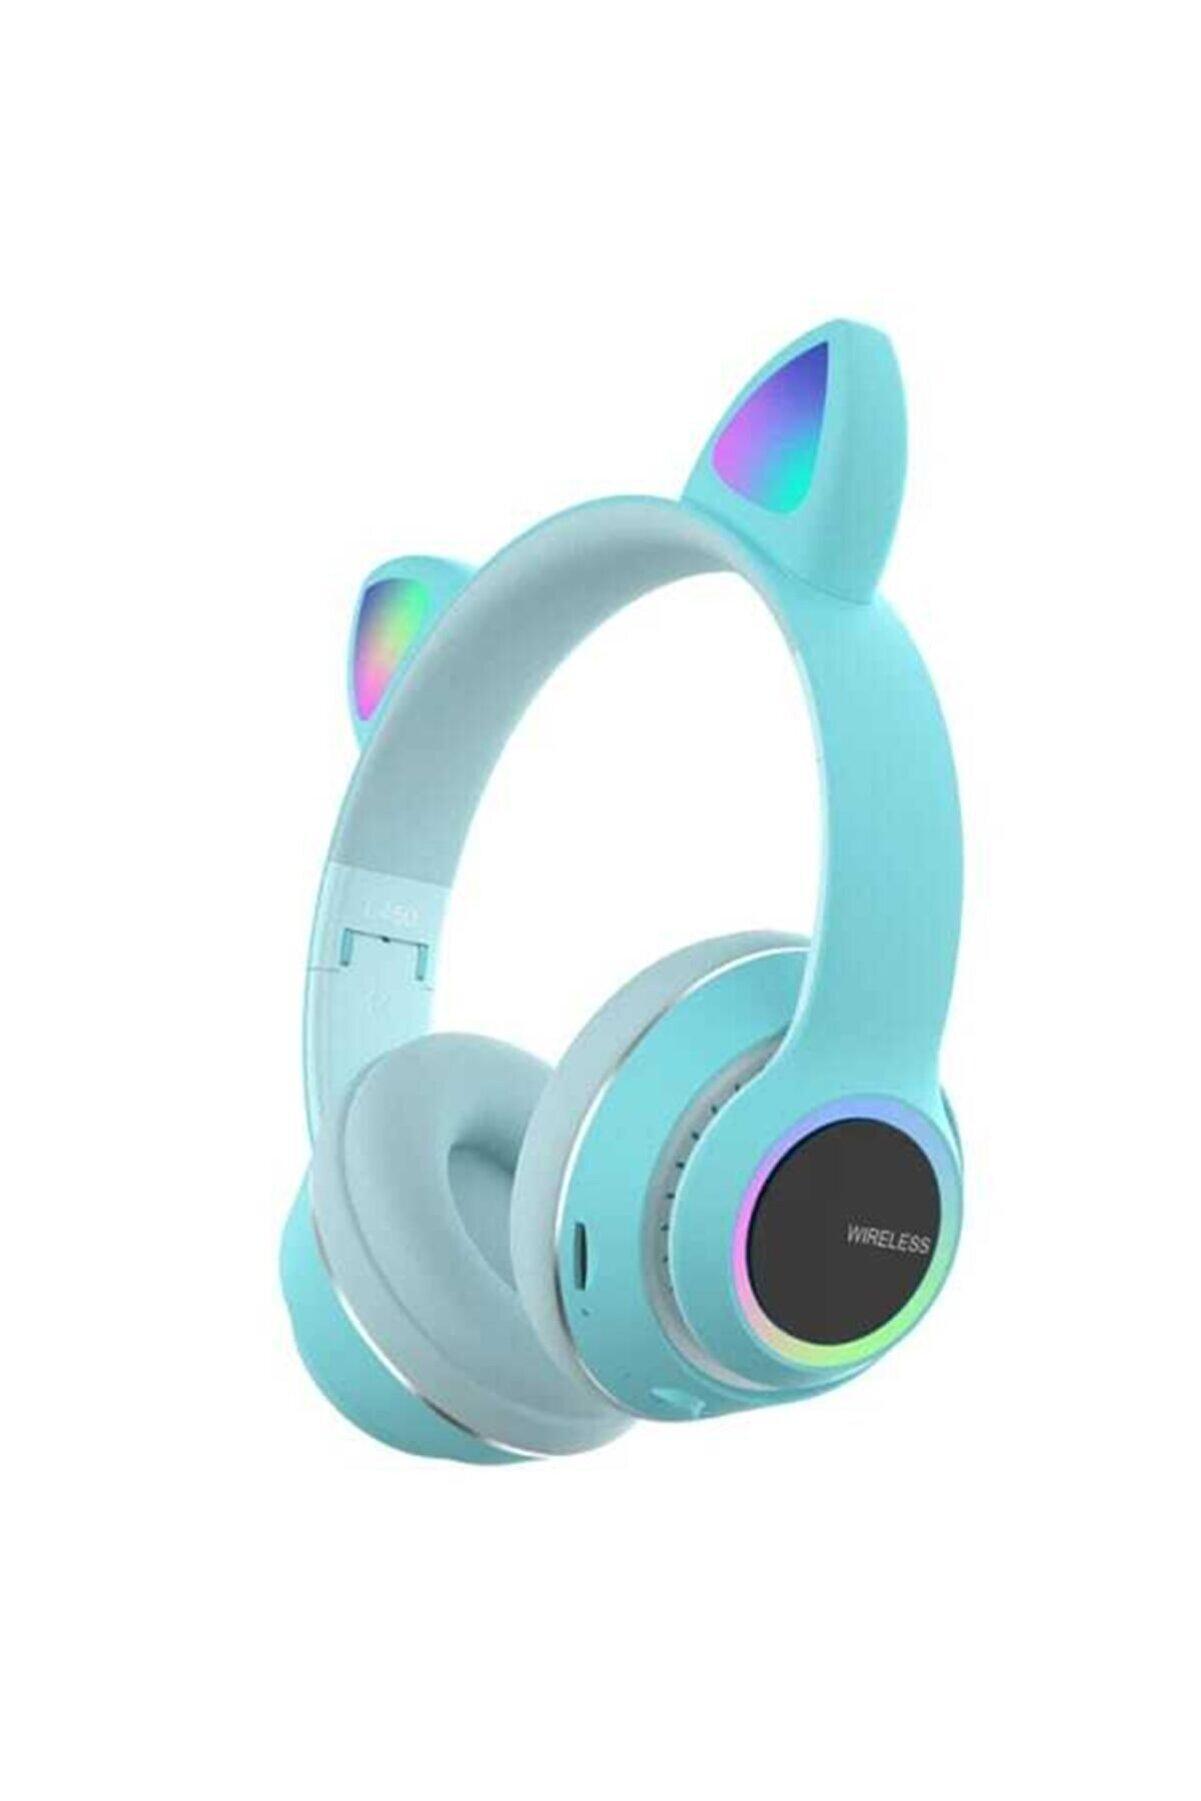 T G Kablosuz Bluetooth 5.0 Stereo Yüksek Ses Akıllı Renkli Led Kulaklık -l450